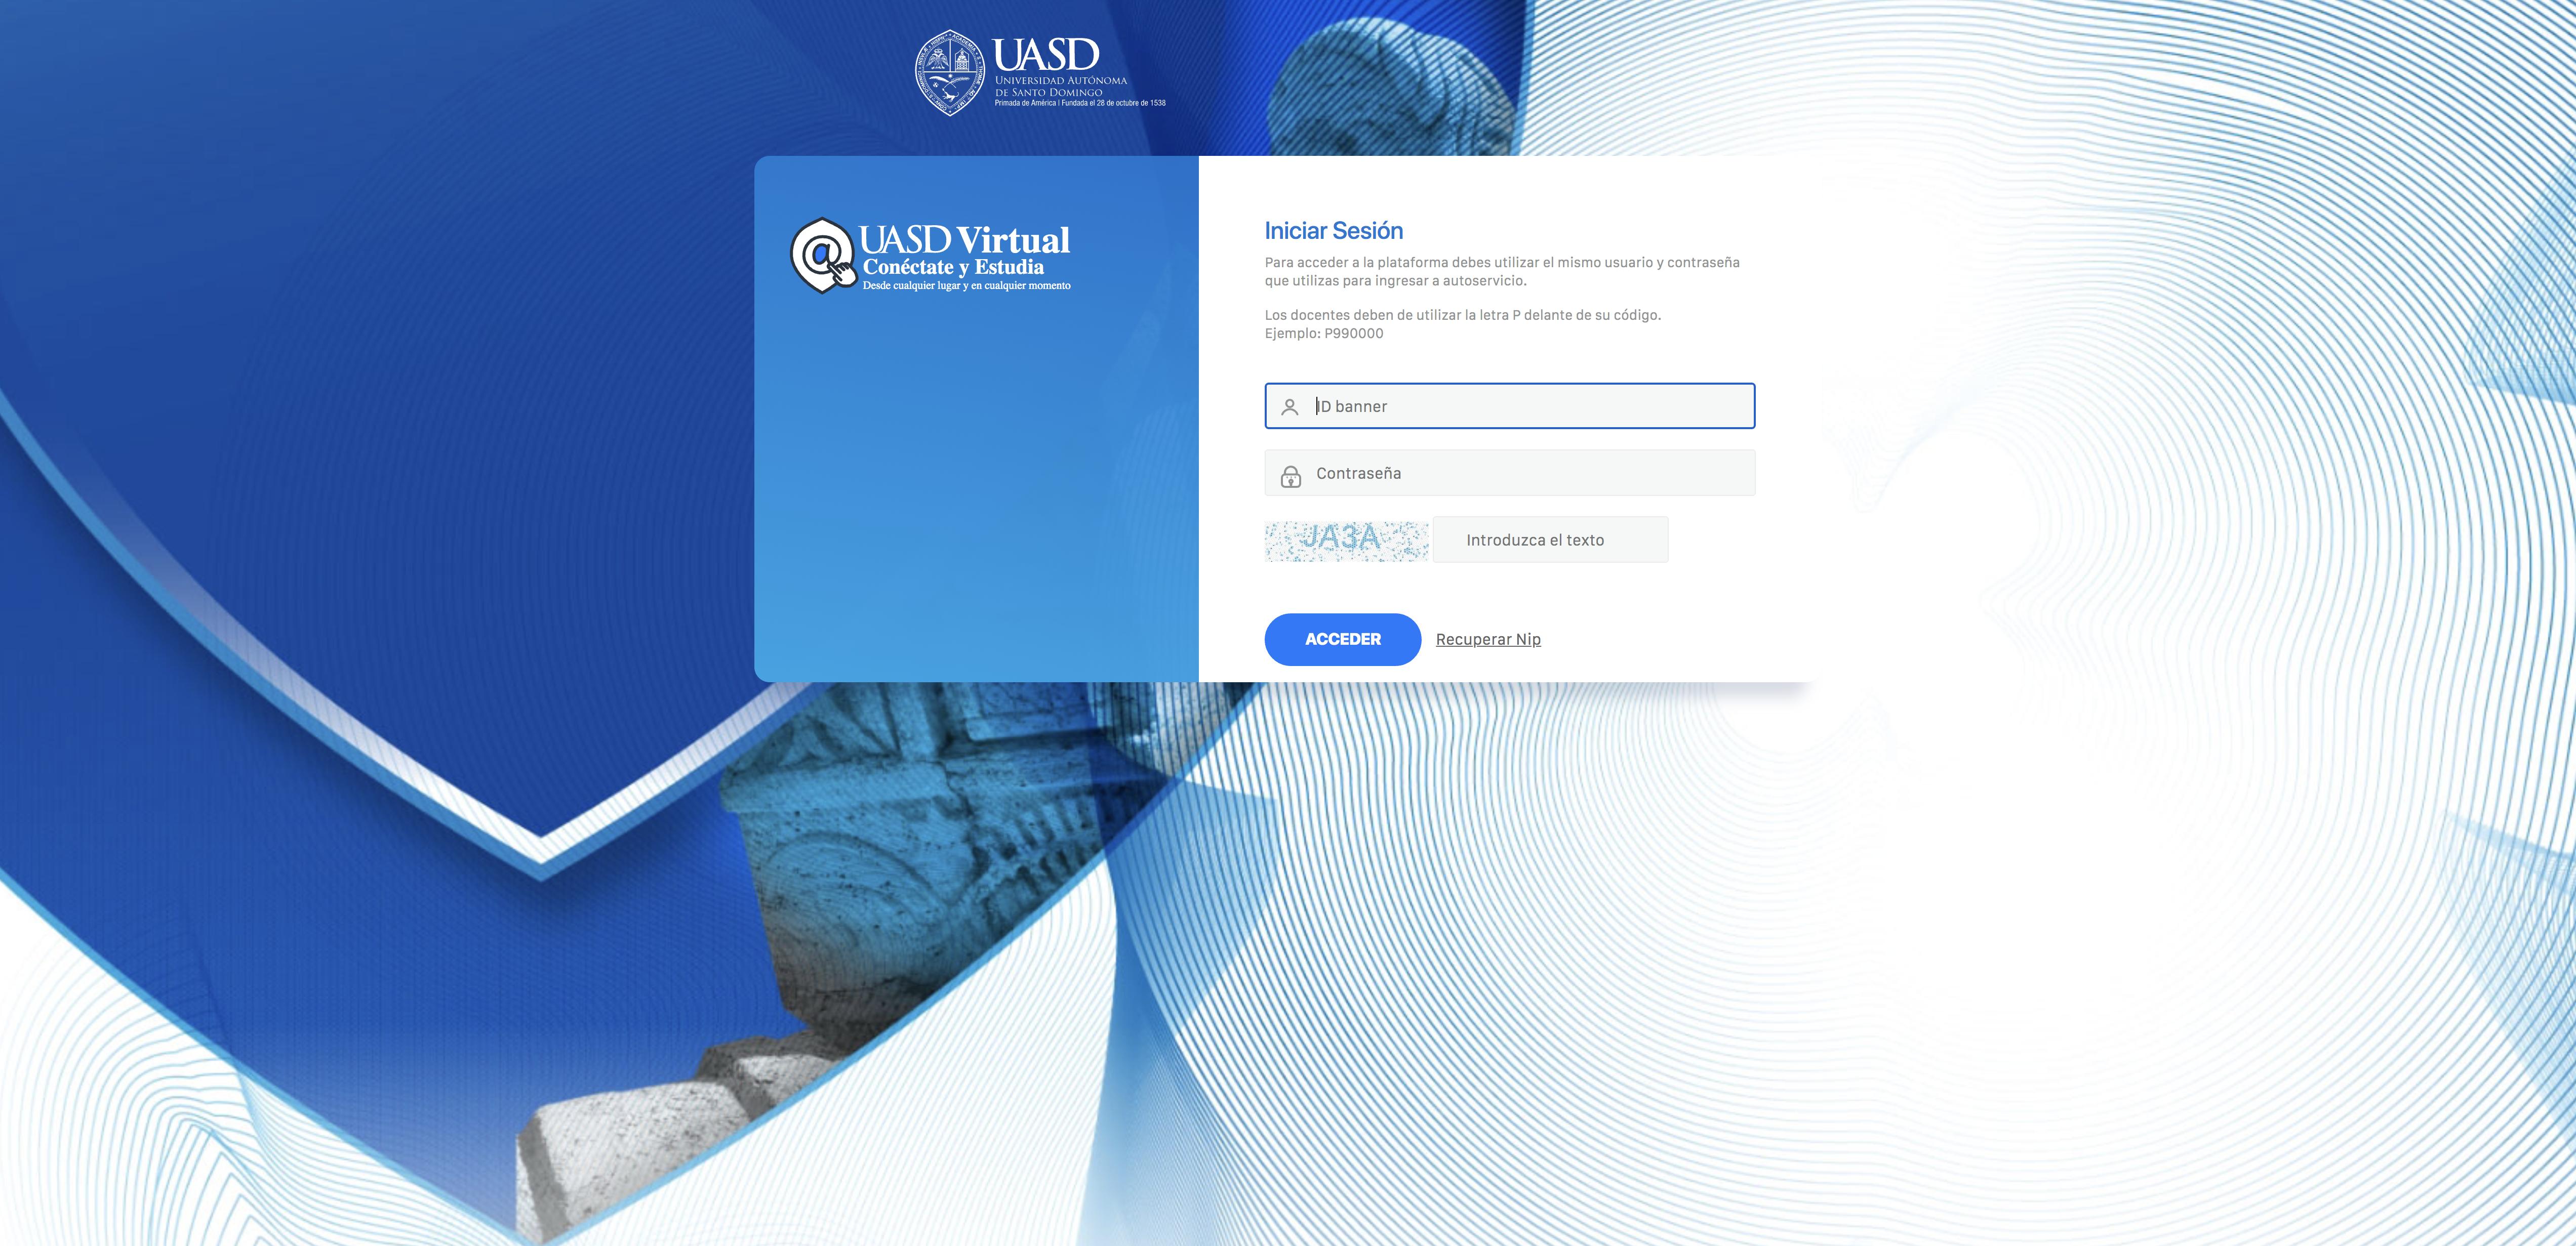 UASD Centro San Juan brinda apoyo en docencia virtual a maestros